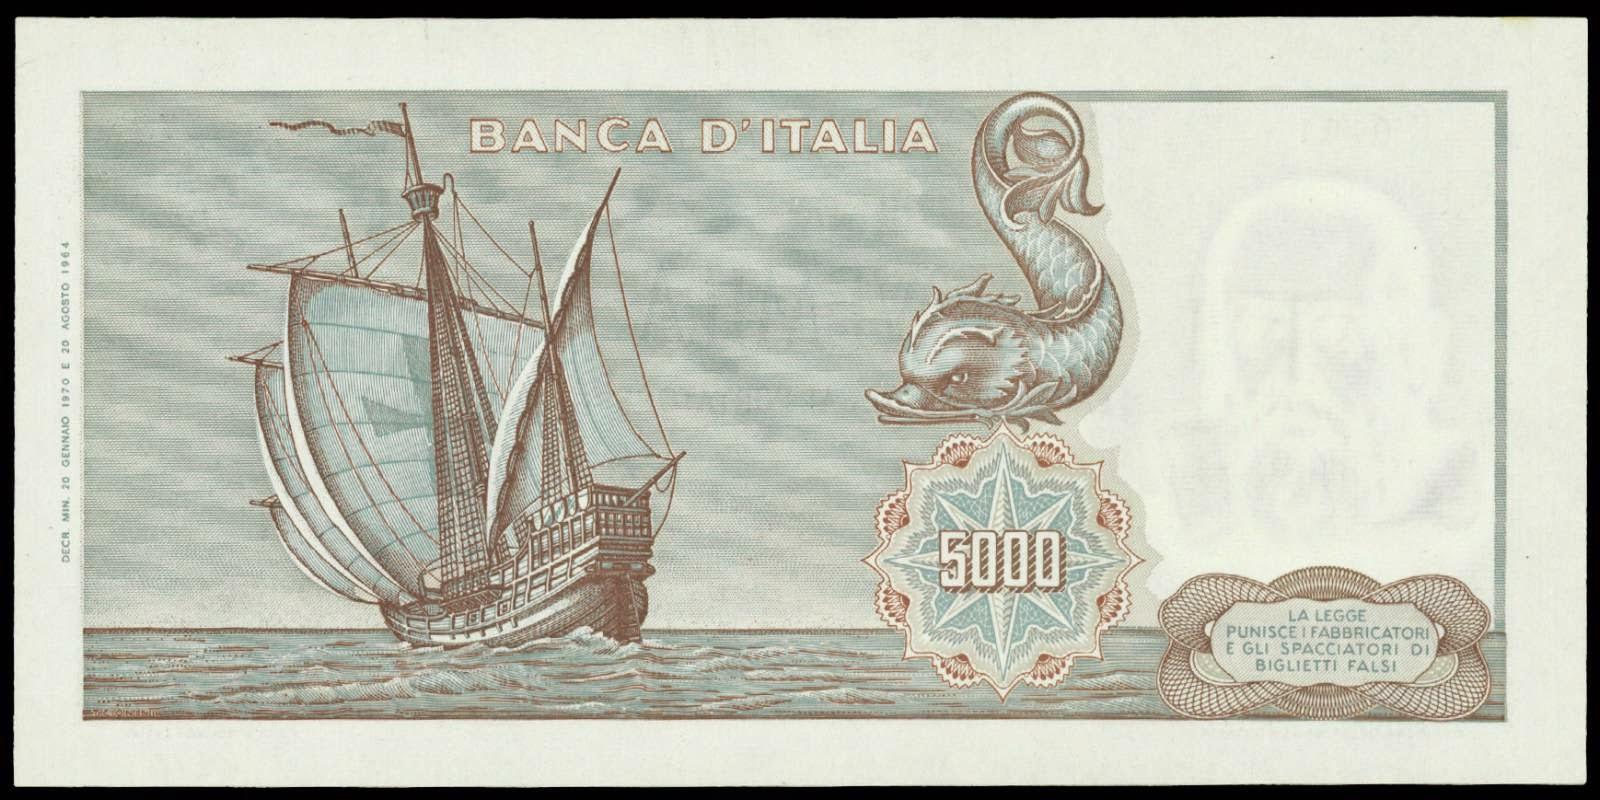 5000 Italian Lira note